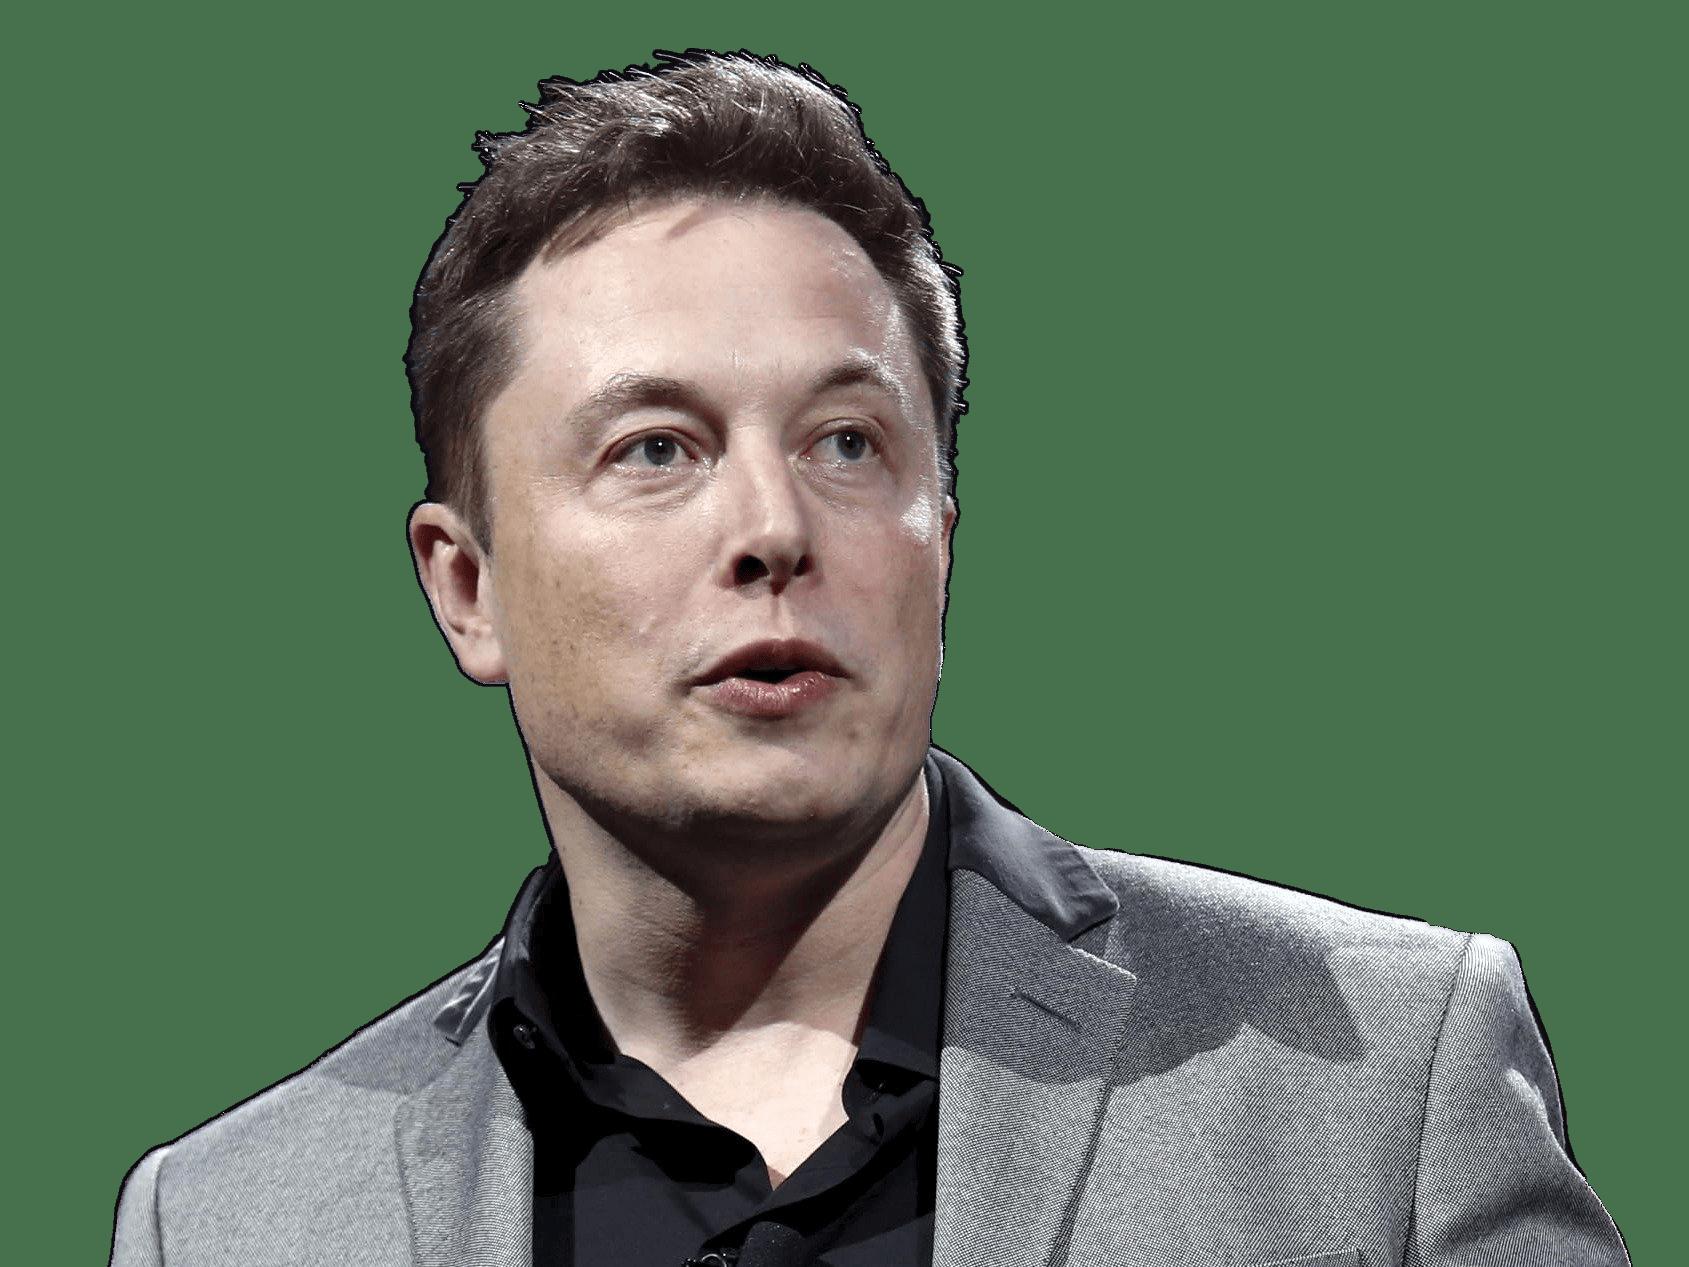 Elon Musk Speaking transparent PNG.